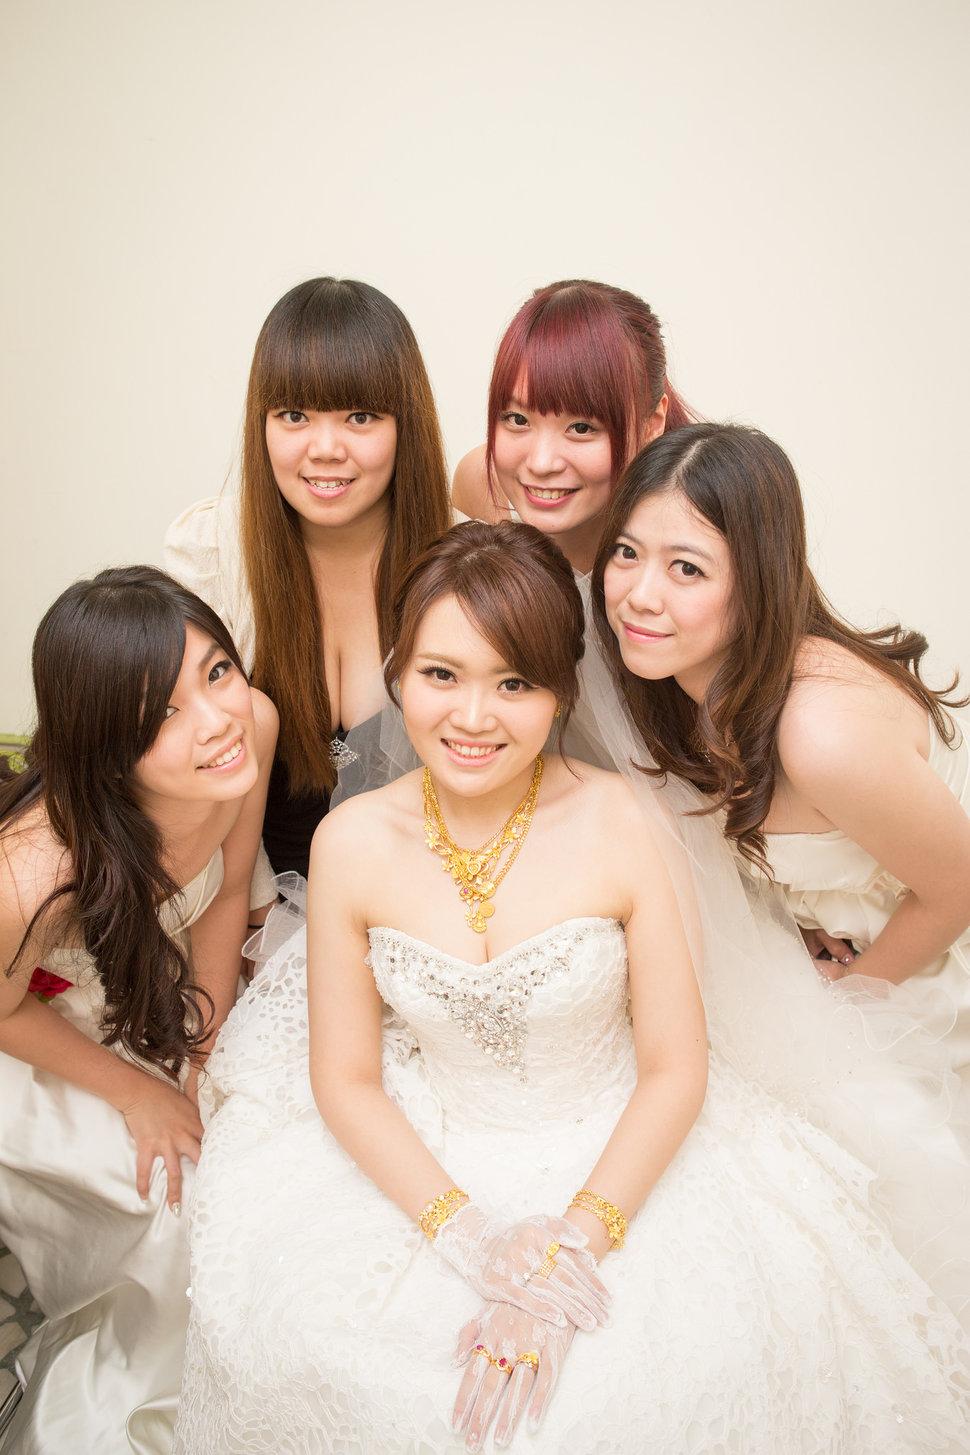 18PHOTO-爵名❤️ 瓊文(編號:220375) - 18PHOTO 婚紗影像攝影工作室 - 結婚吧